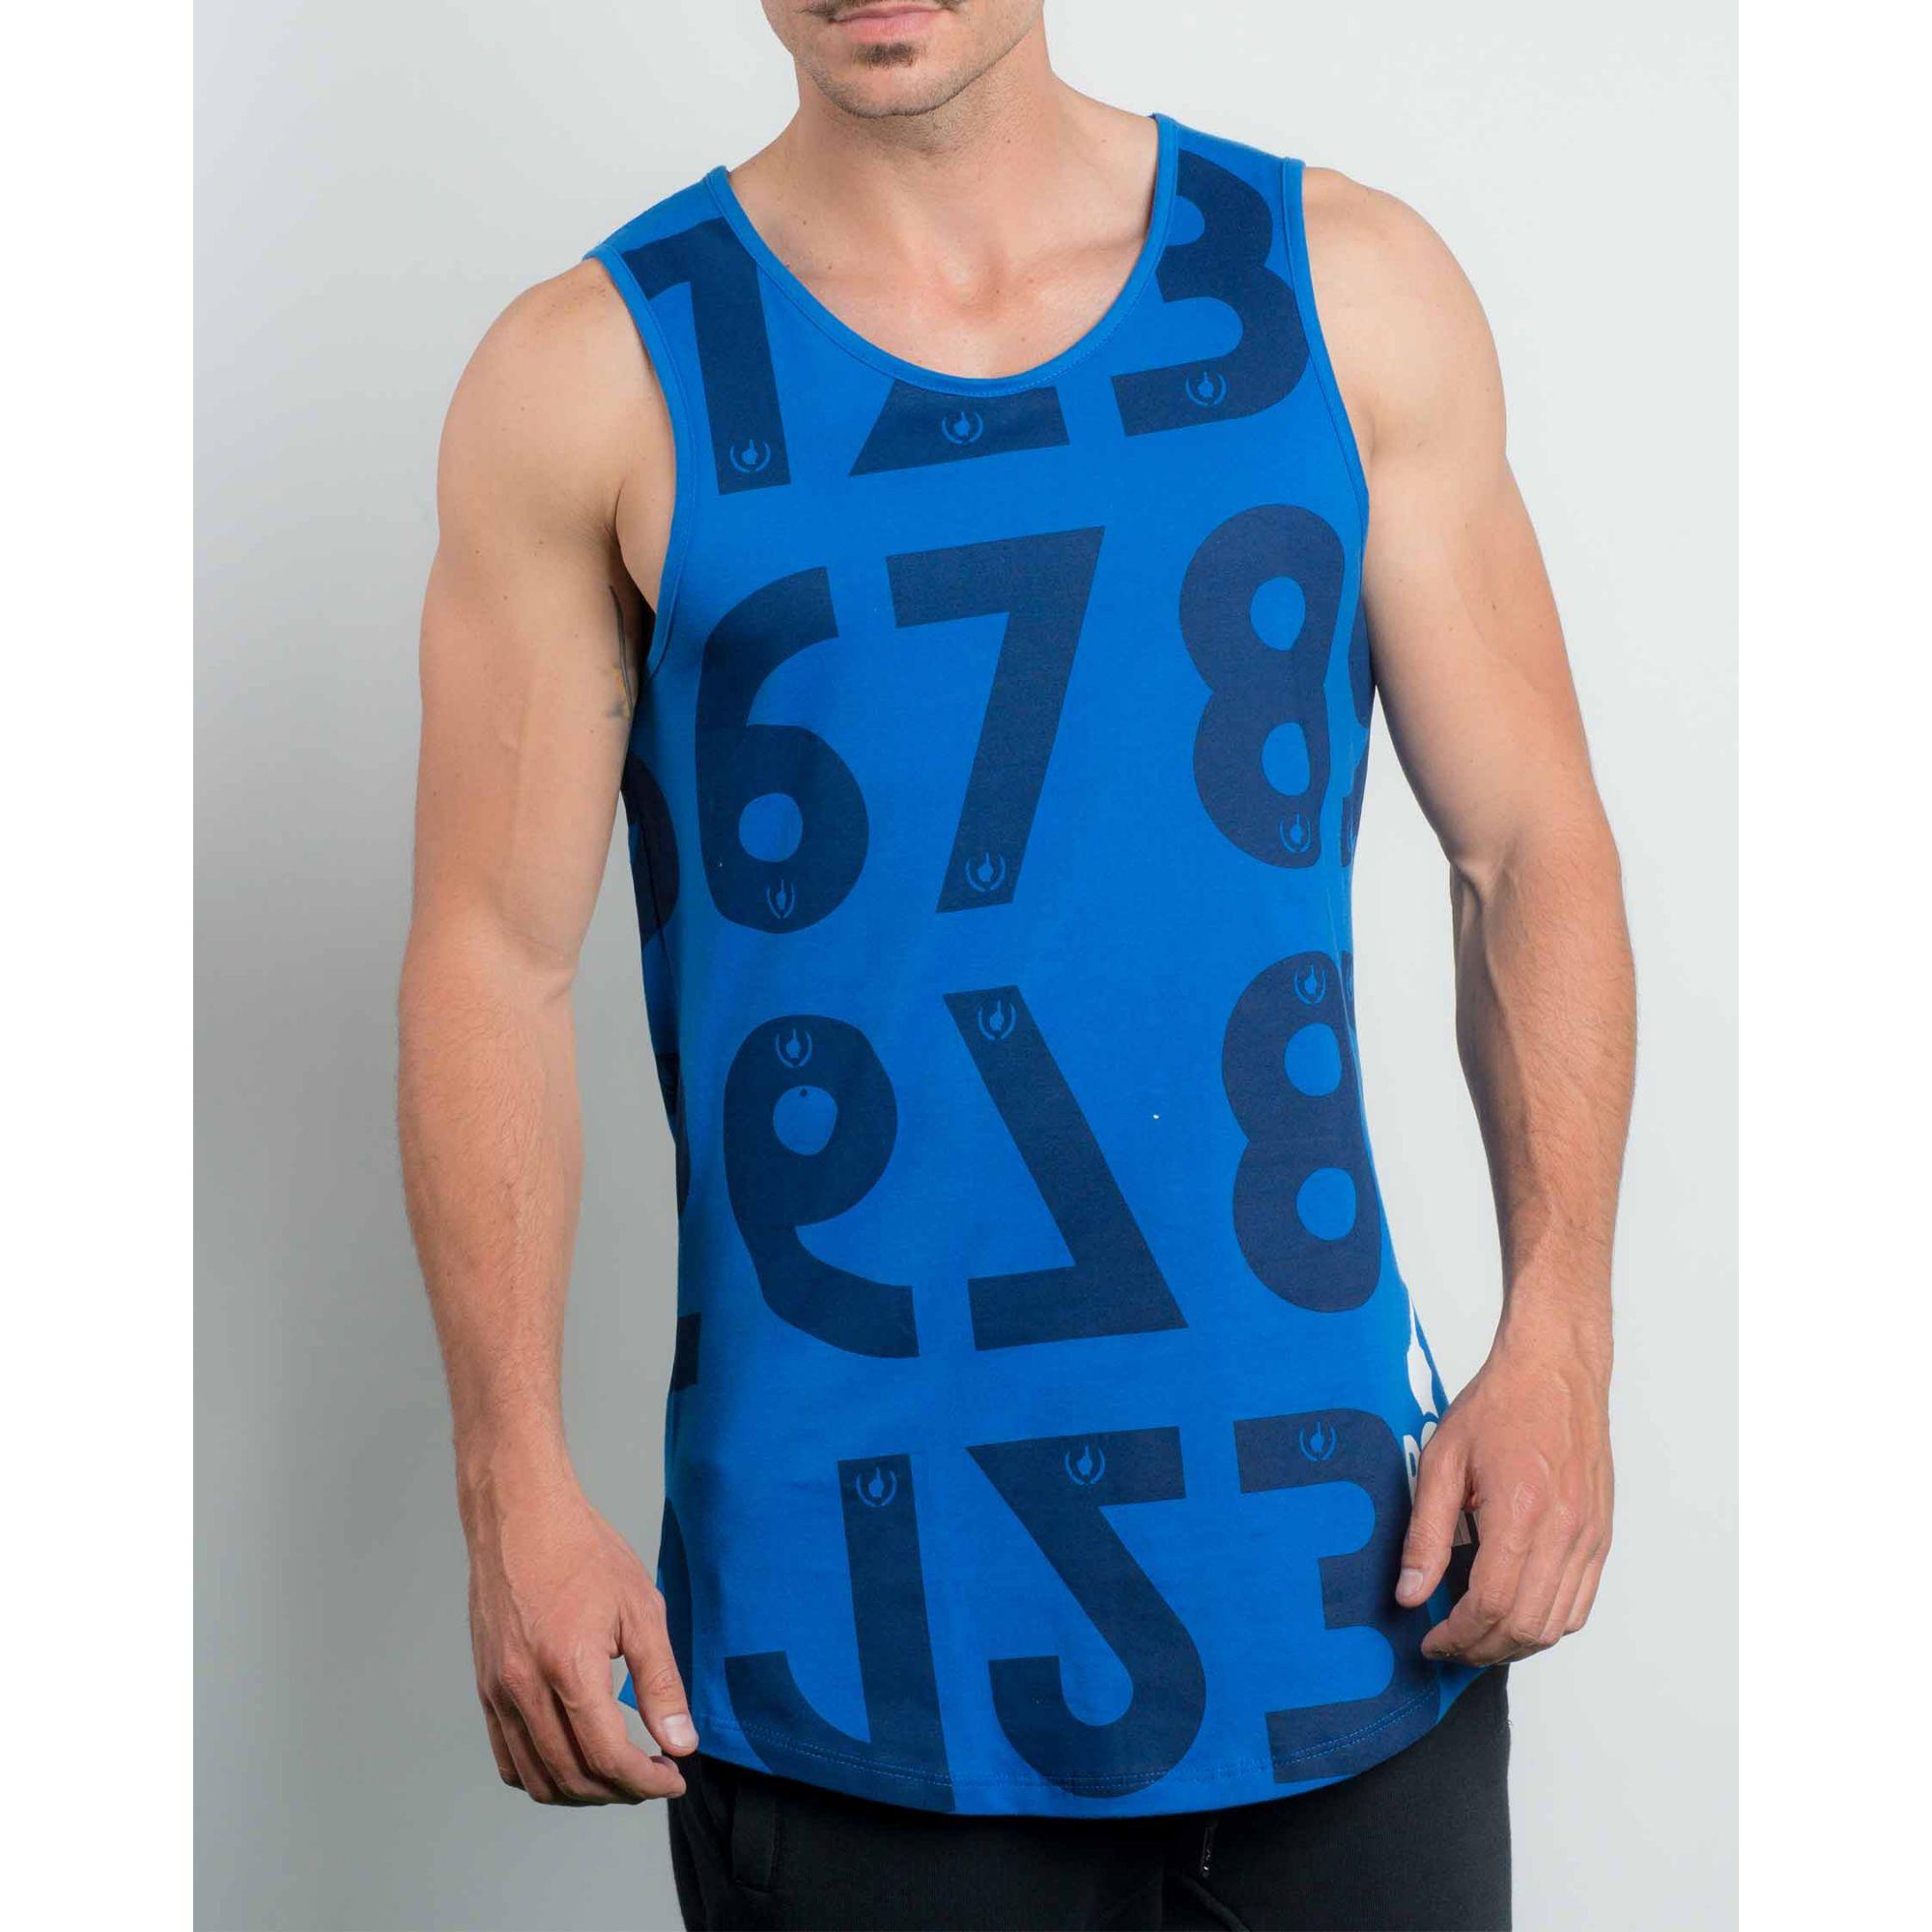 Regata Buh  Numbers Blue & Black